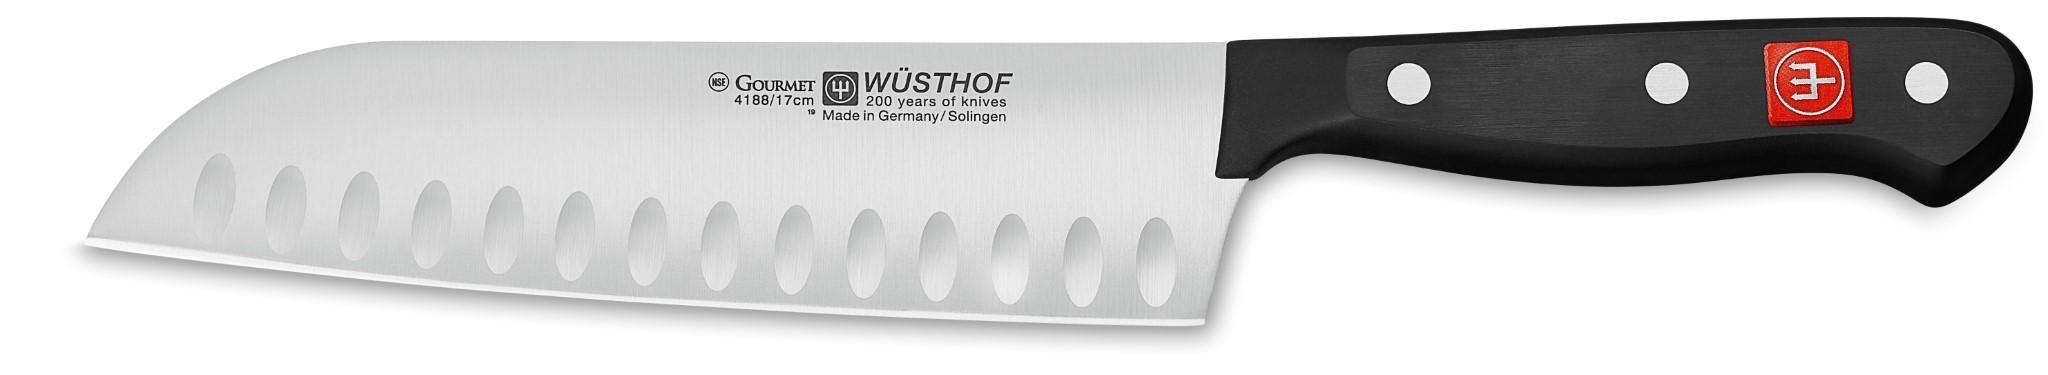 Wüsthof Santoku-Messer 17 cm Kullenschliff Gourmet 4188//17